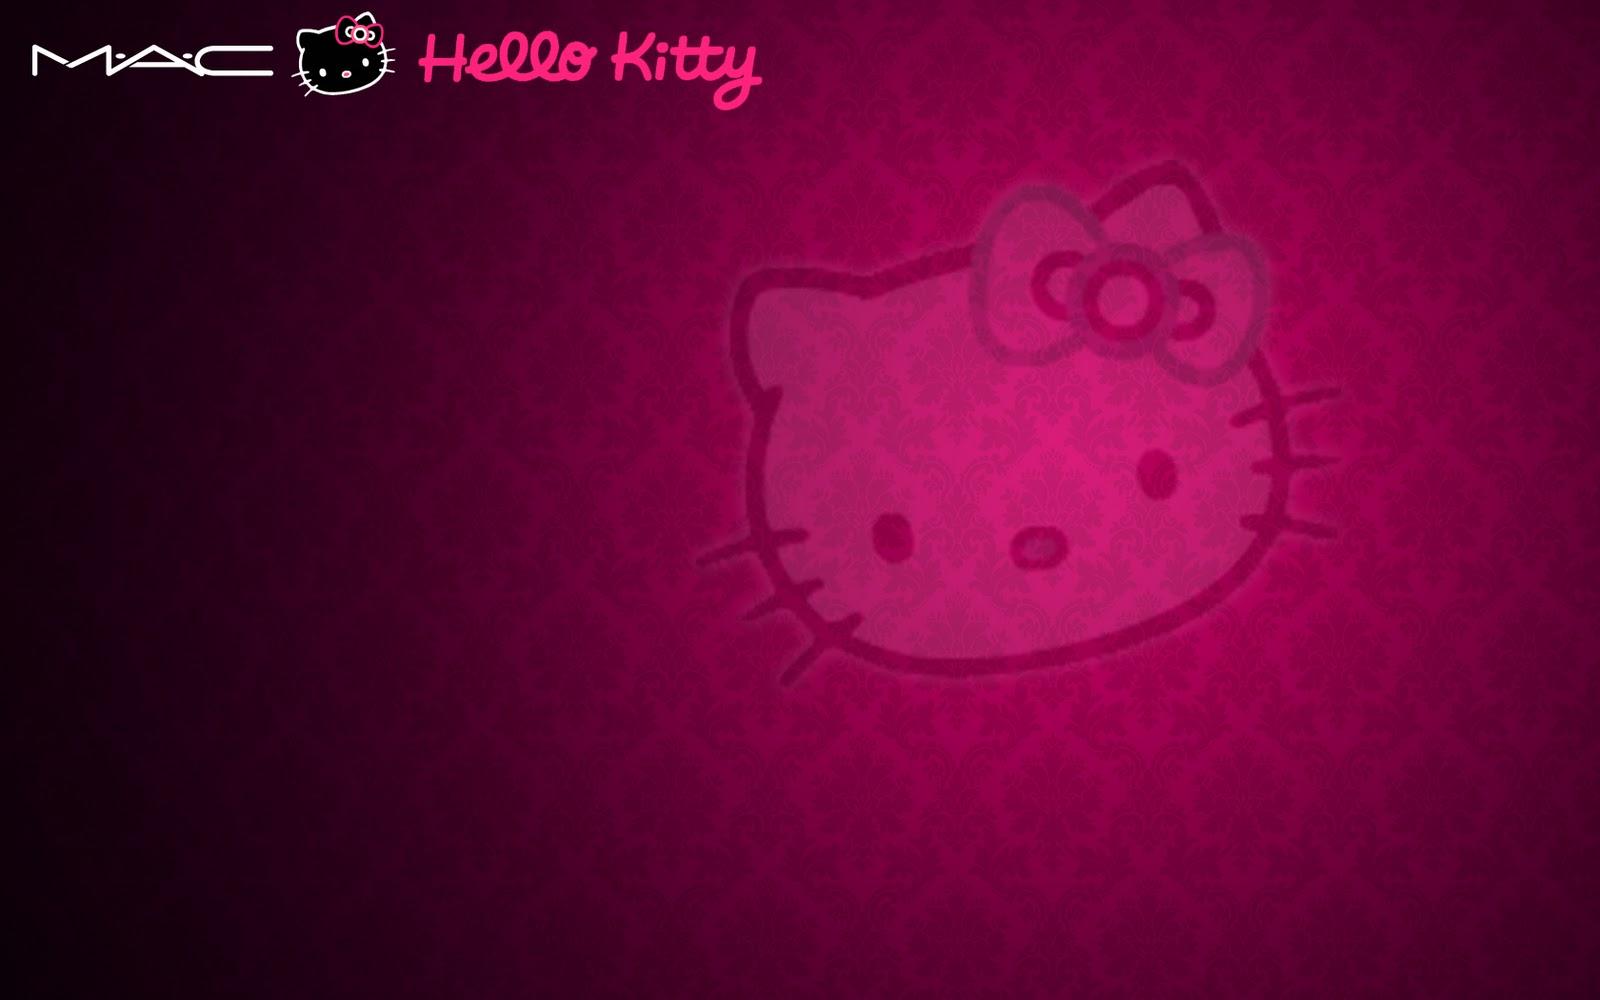 Top Wallpaper Hello Kitty Purple - MAC_Hello_Kitty_Wallpaper_by_angeldust  You Should Have_715443.jpg